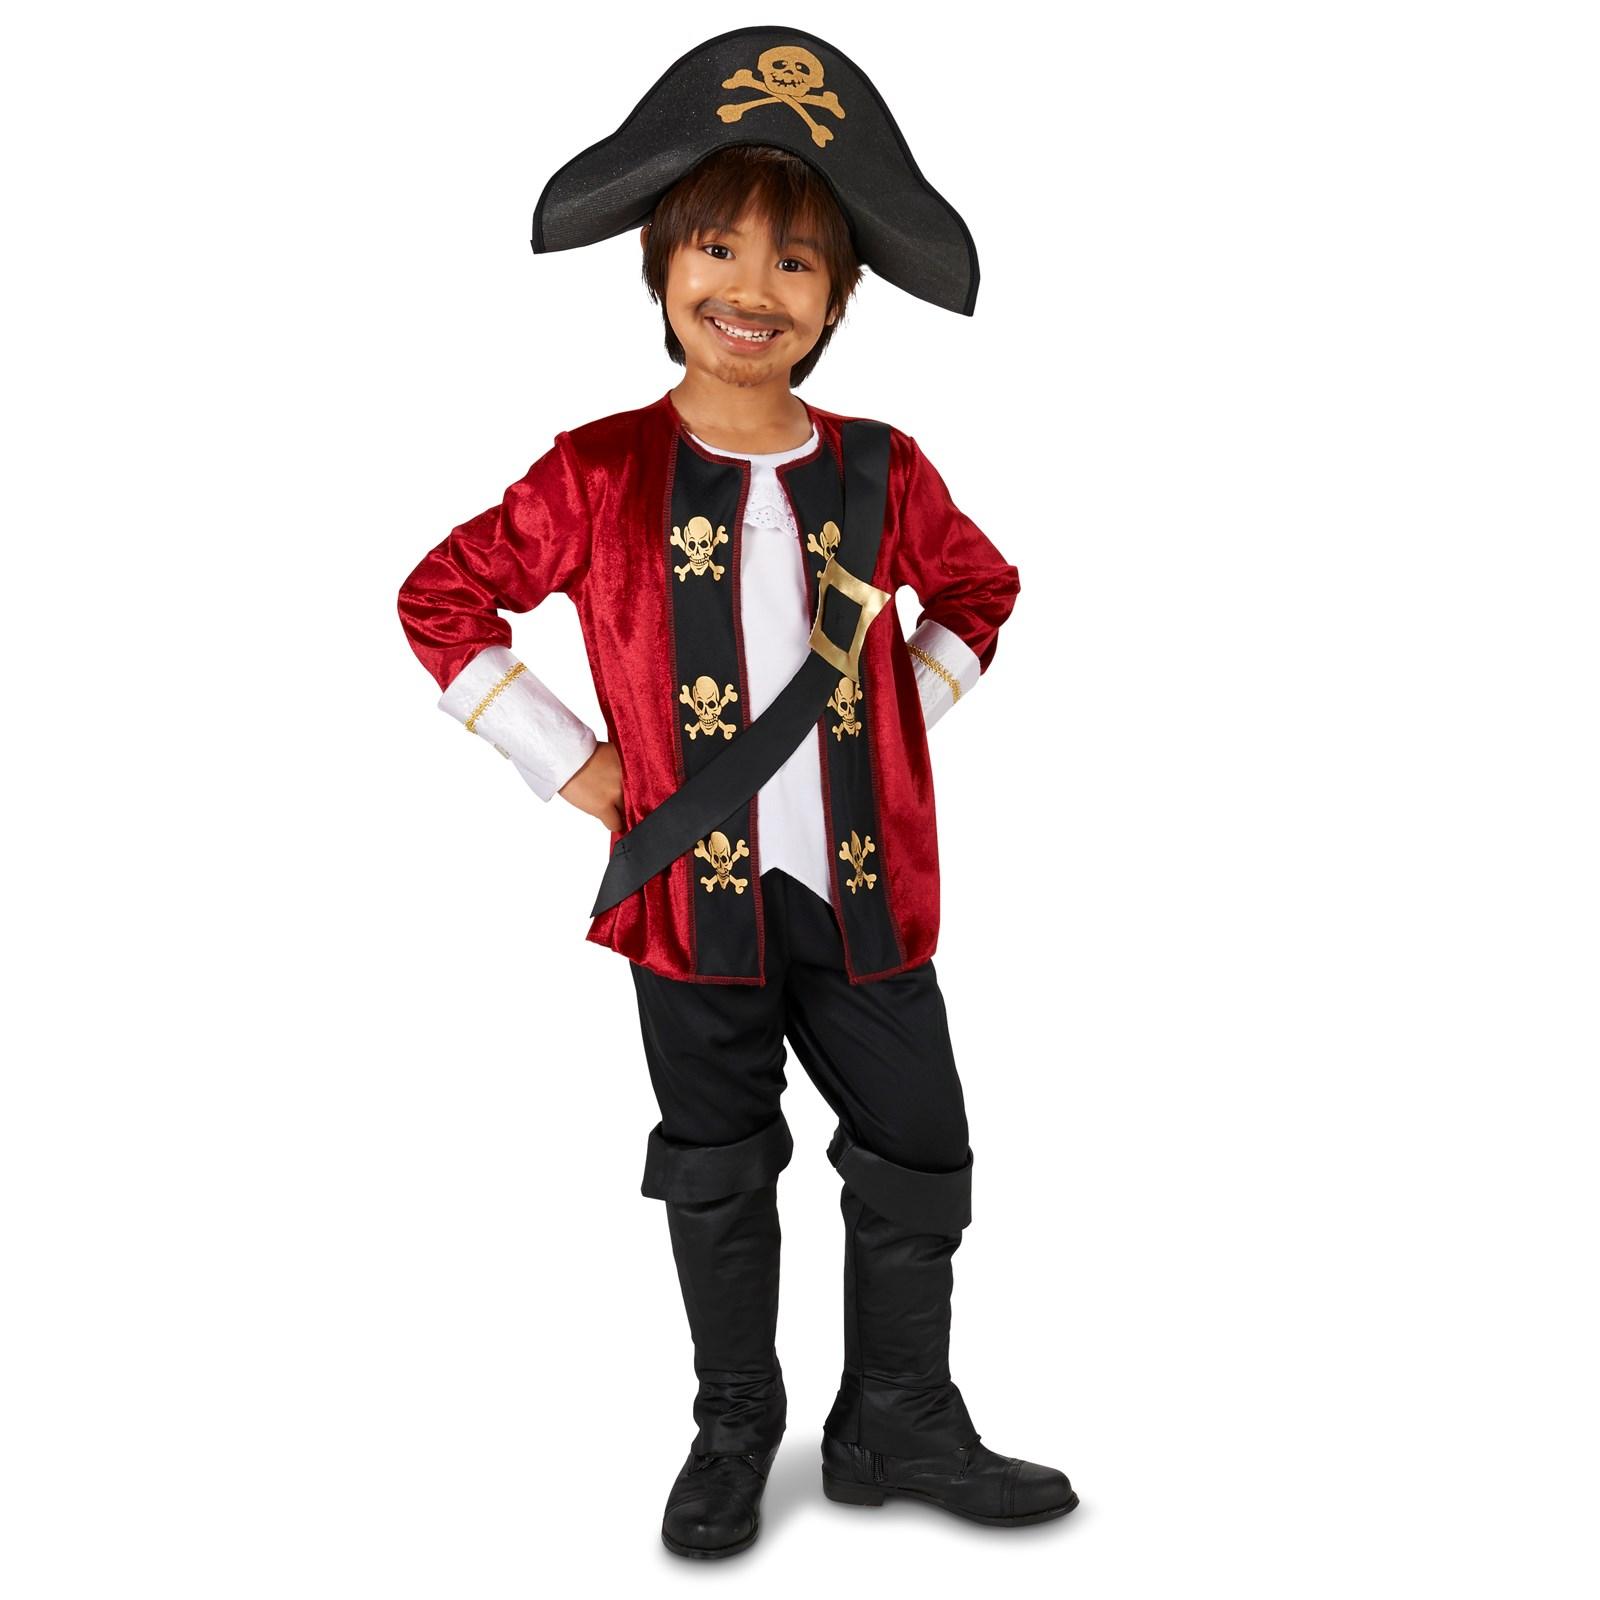 The Captain Pirate Child Costume | BuyCostumes.com